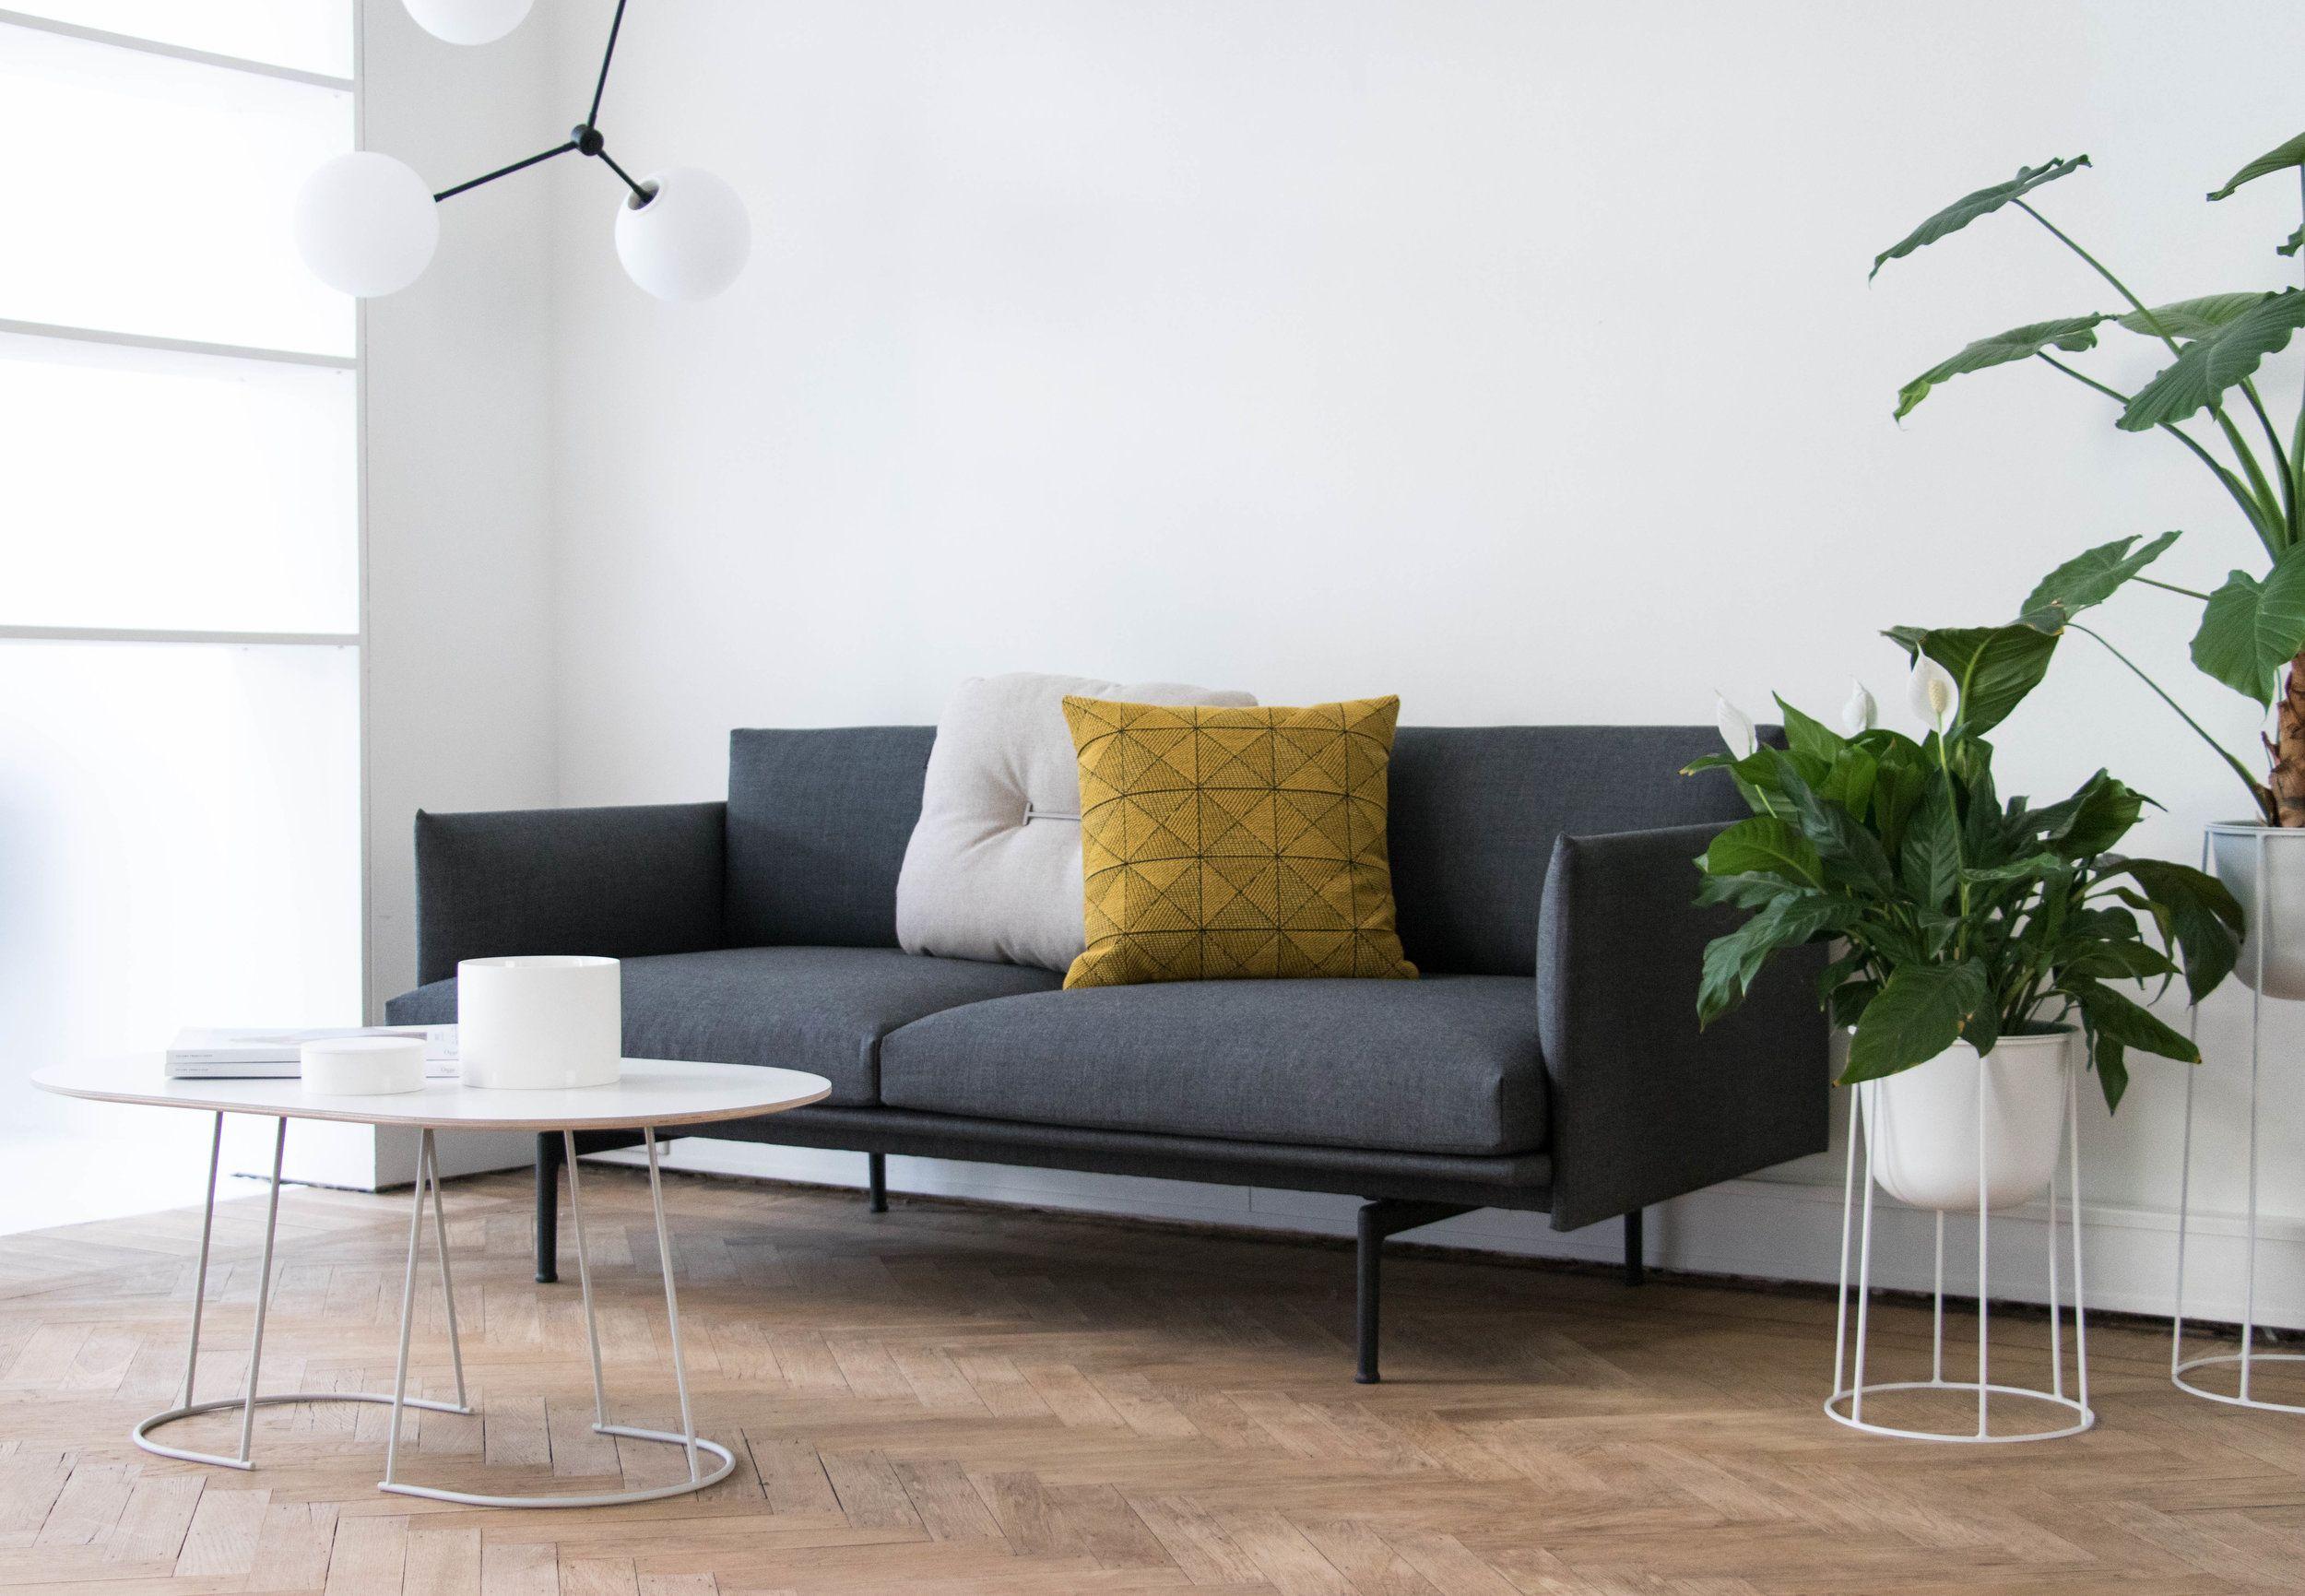 Outline Sofa Muuto Scandinavian Design Livingroom Home Interiors Styiling Woonkamerbank Sofa Interieur